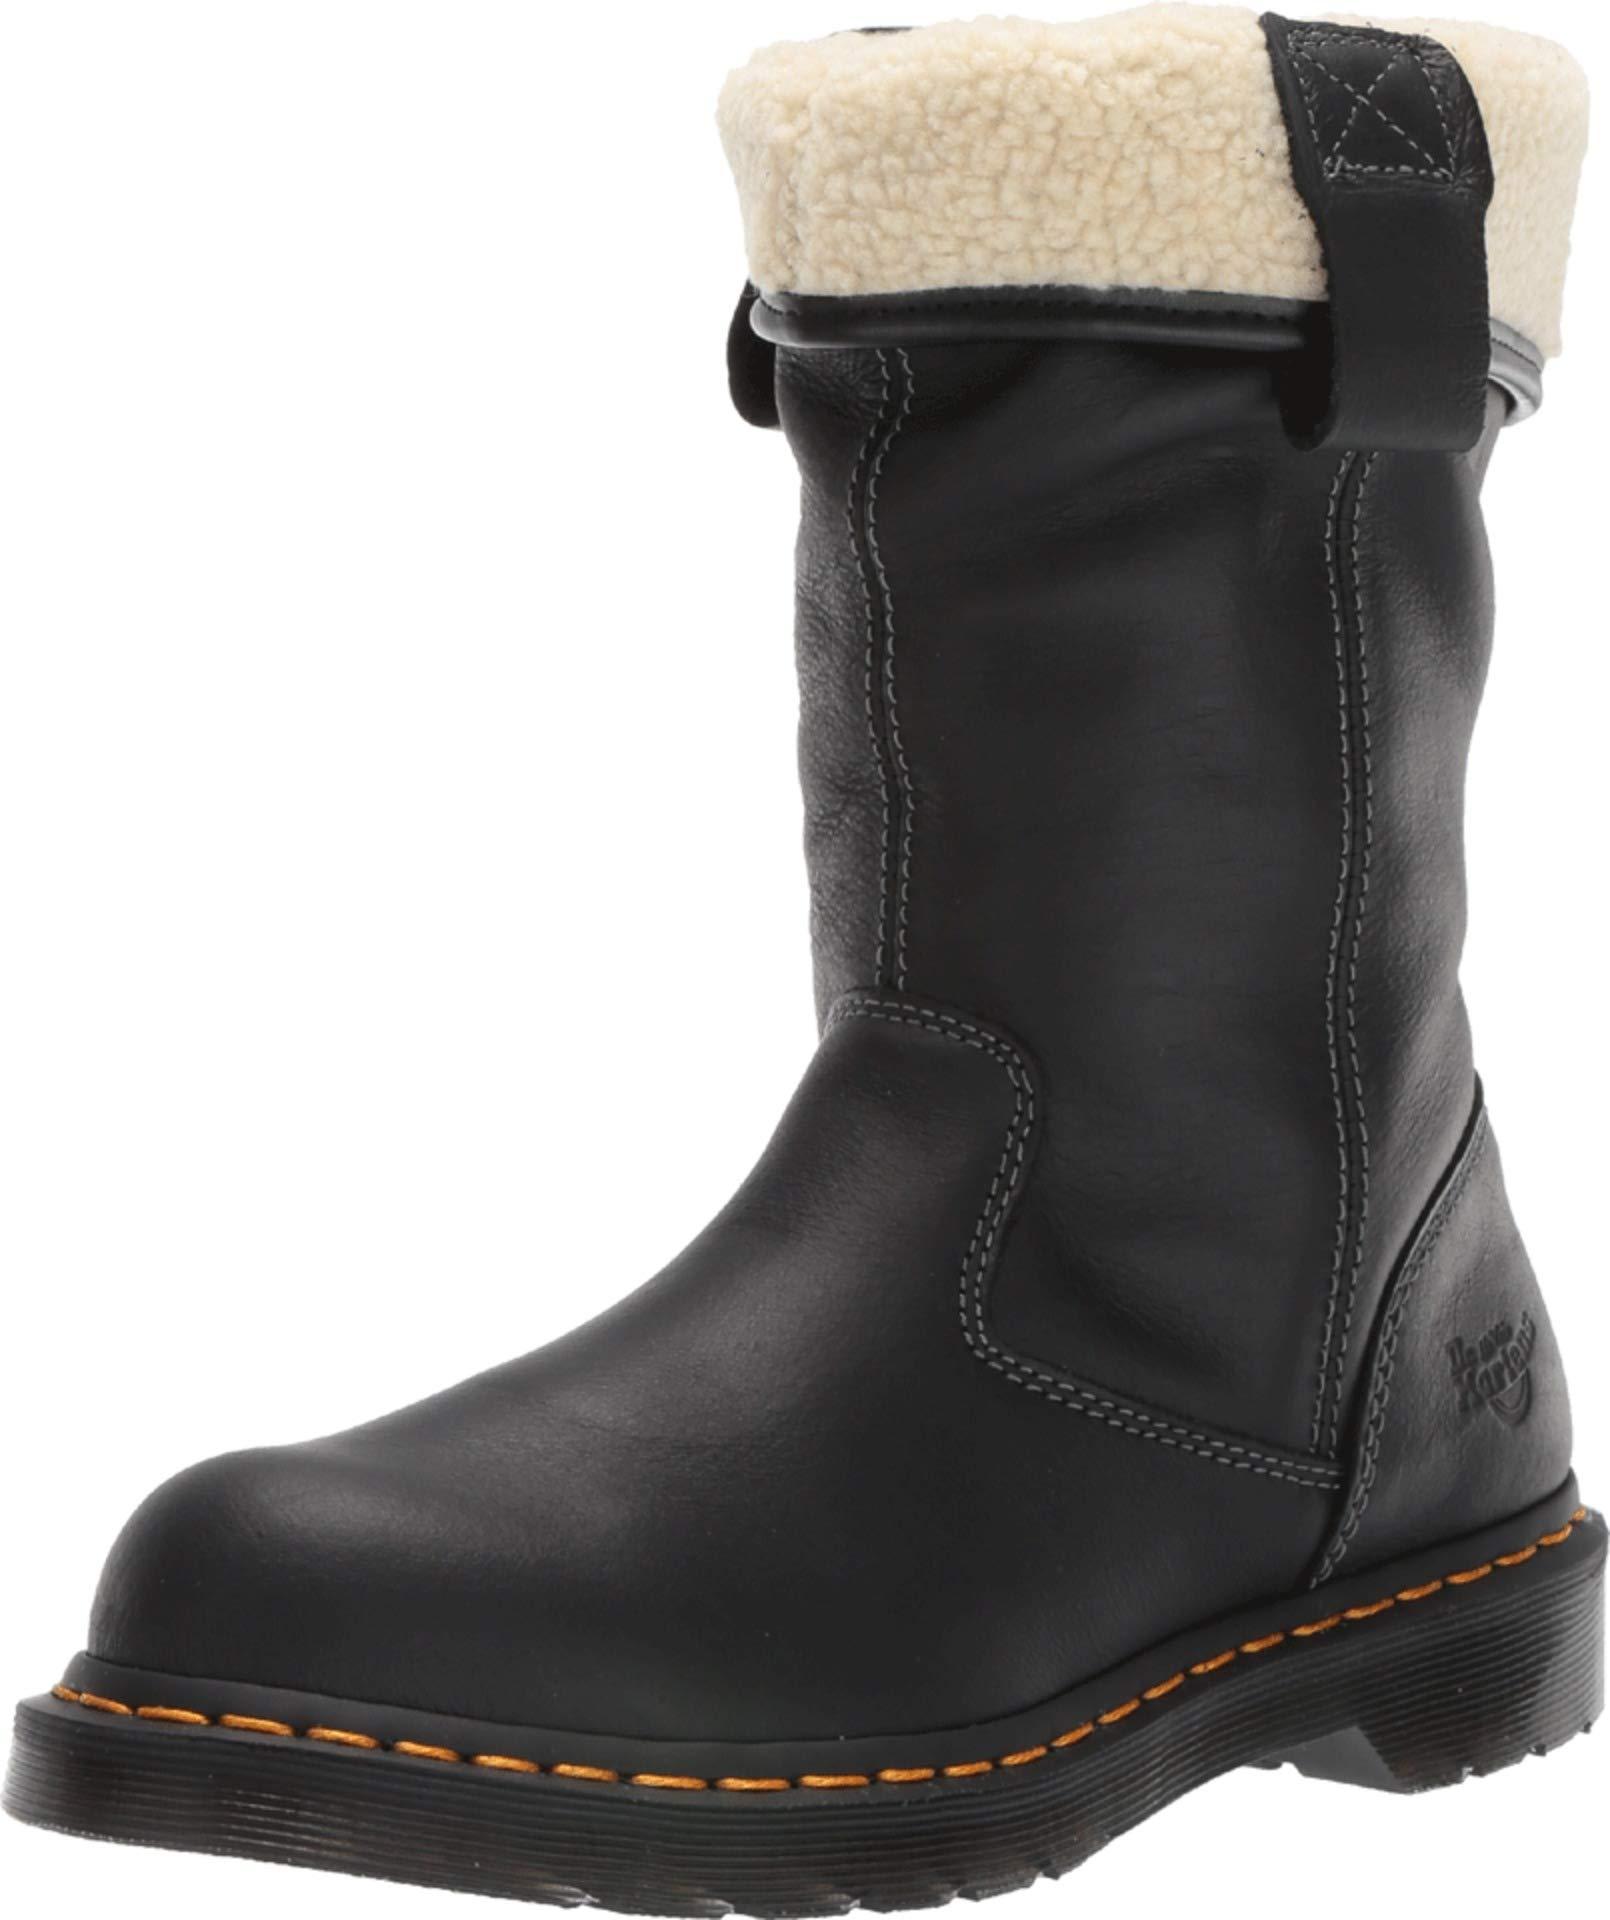 Dr. Martens - Women's Belsay ST Light Industry Boots, Black, 9 US by Dr. Martens